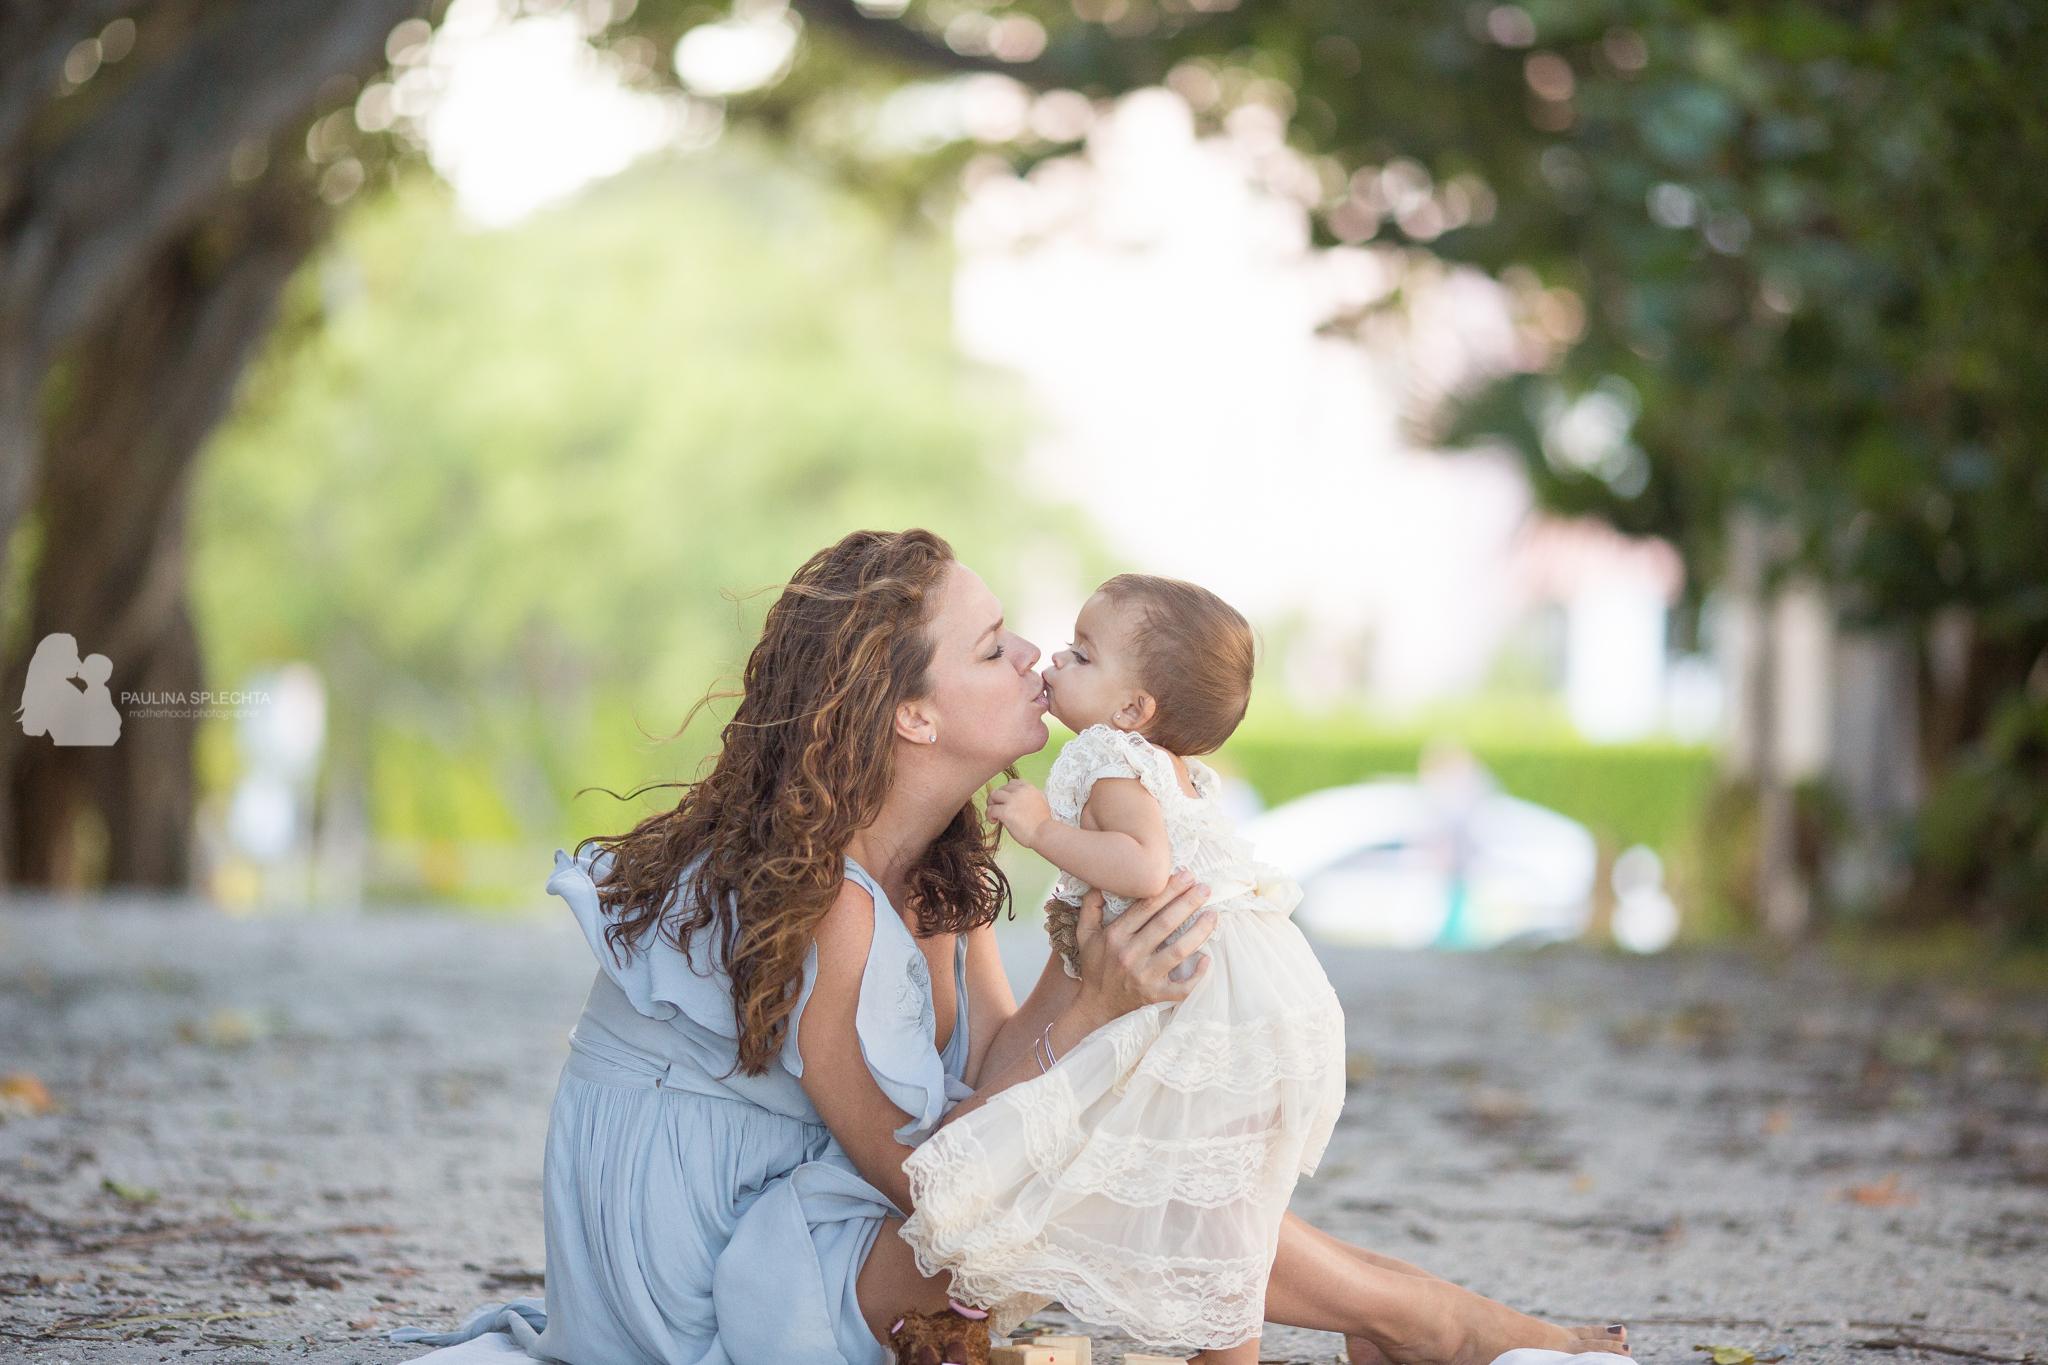 birth-photographer-breastfeeding-family-child-newborn-cake-smash-pregnancy-maternity-19.jpg